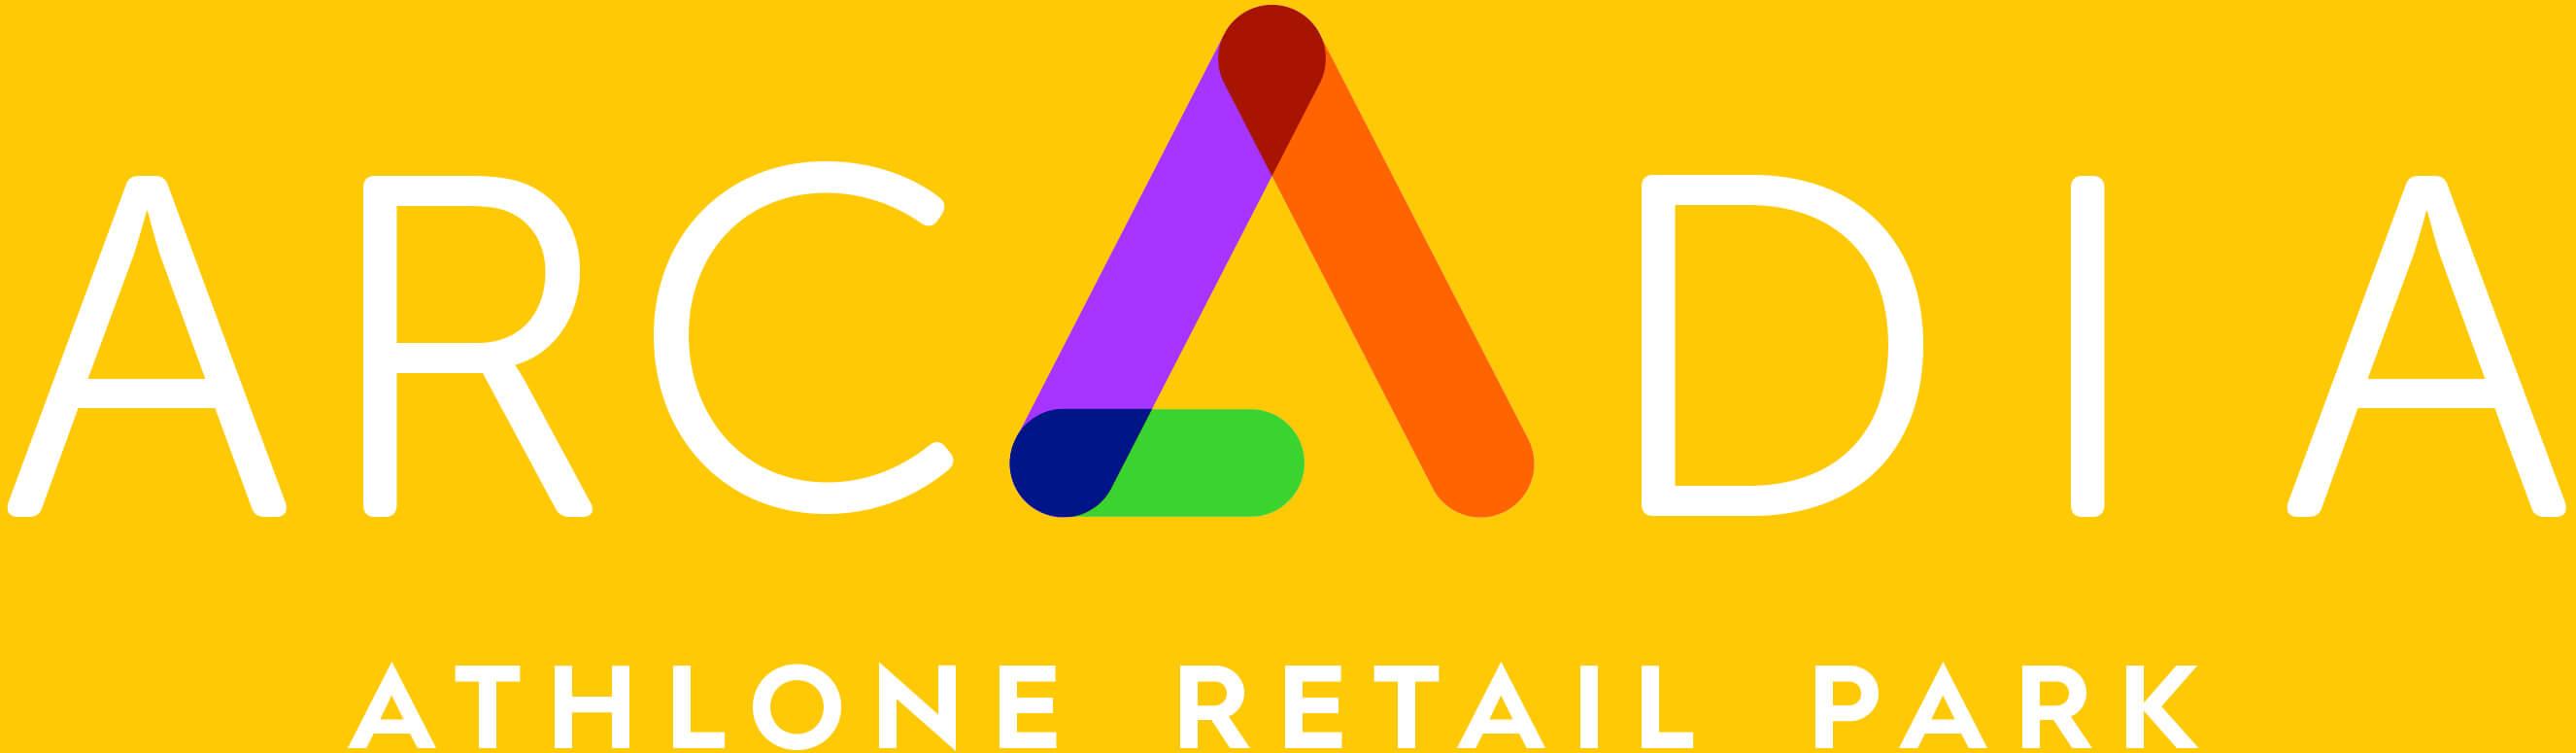 Arcadia Athlone Retail Park Logo